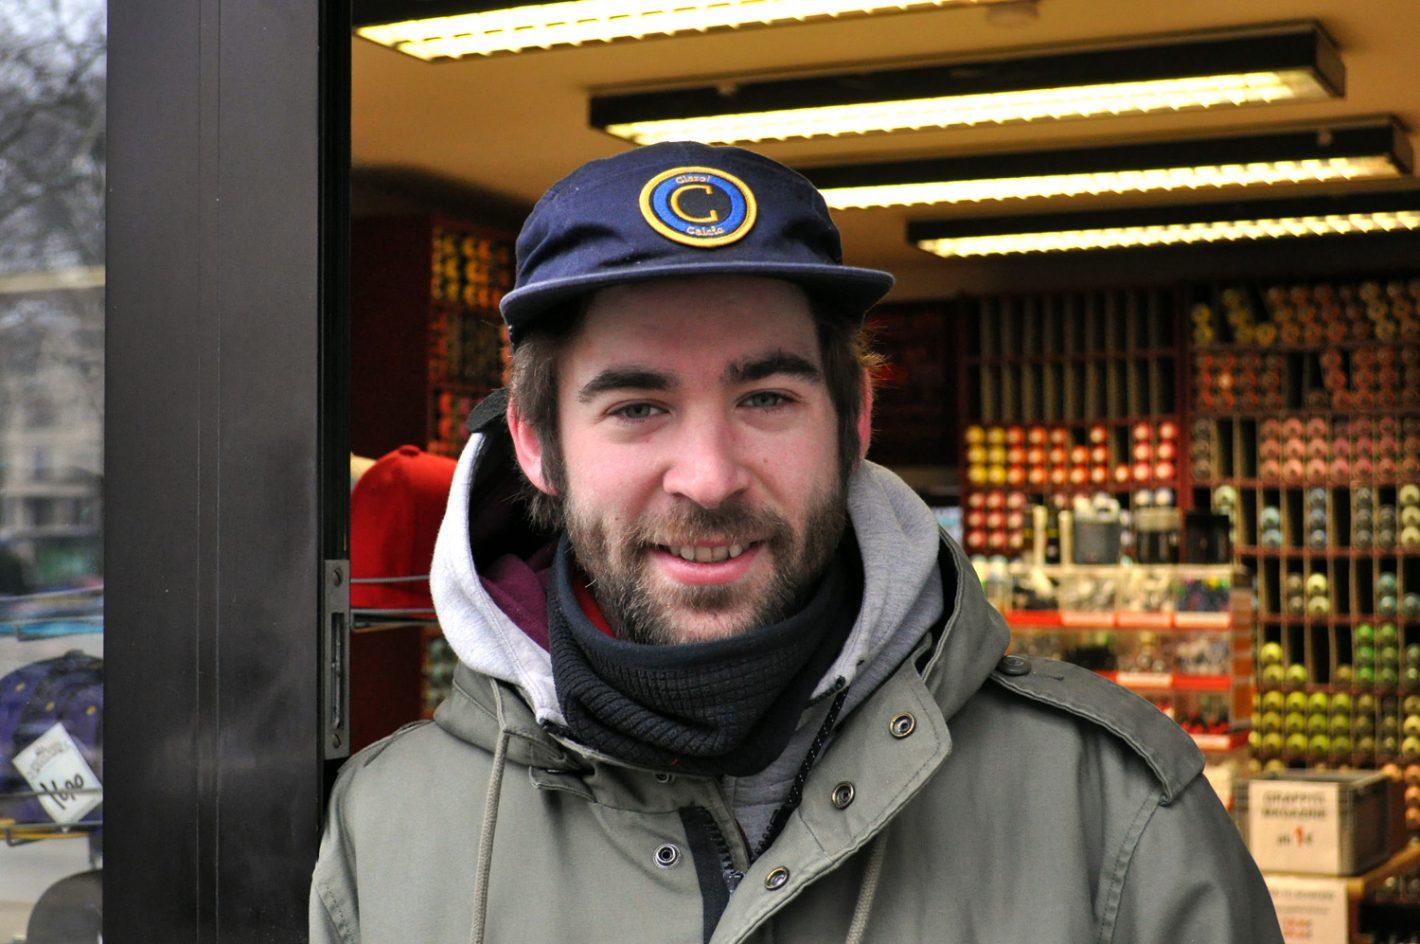 Mann mit Kappe